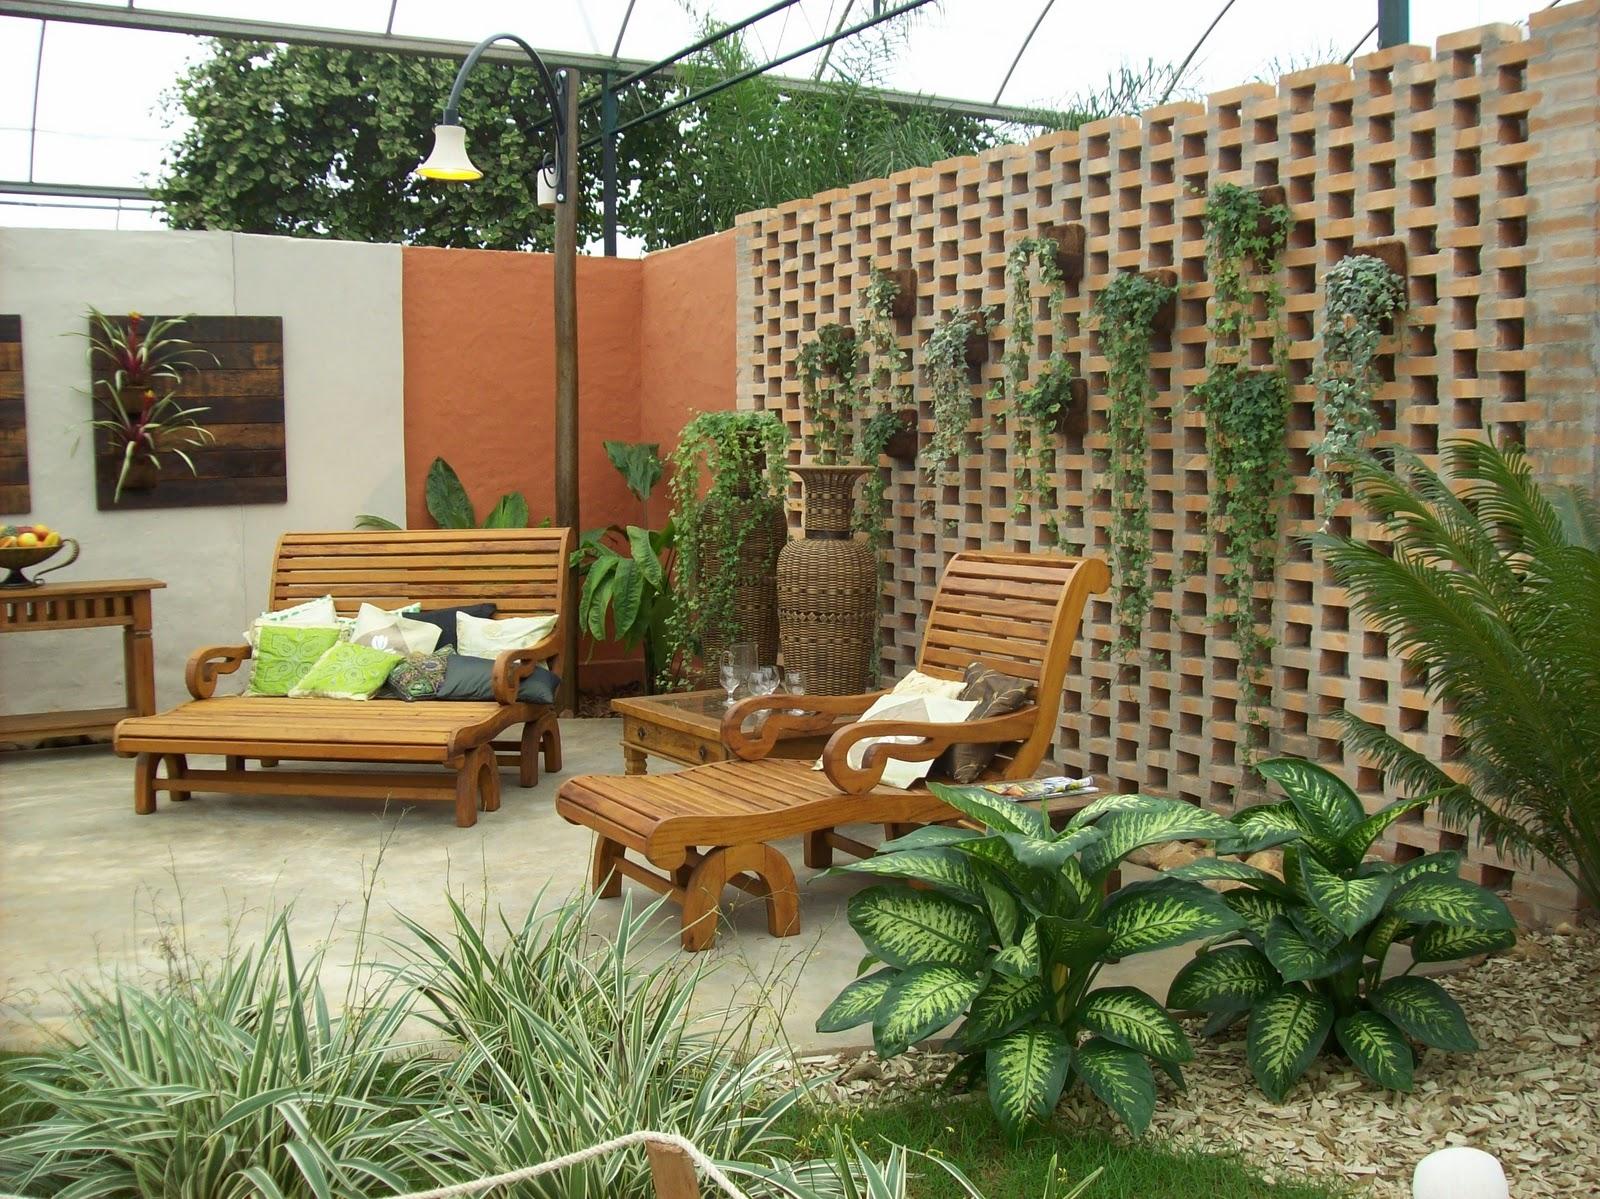 decorar jardim jogos:Decoracao De Jardim Pequeno